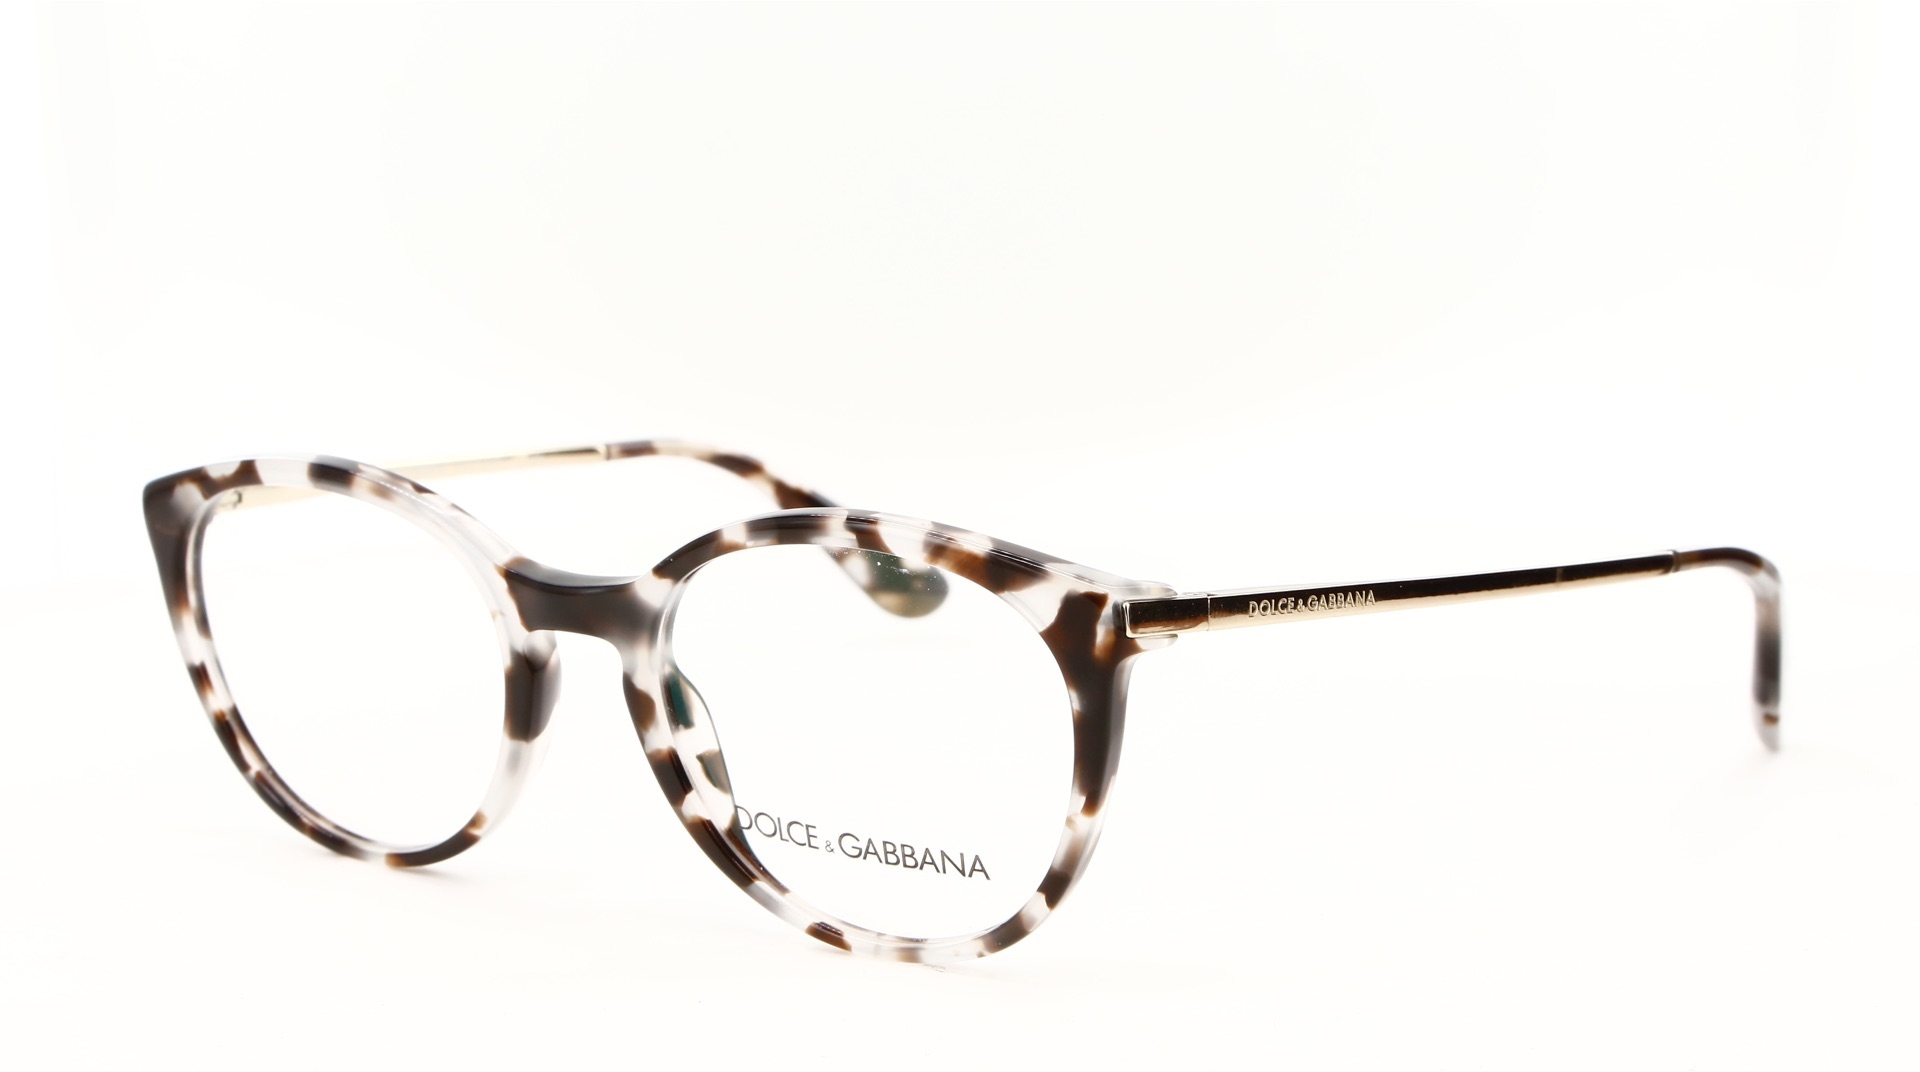 Dolce & Gabbana - ref: 74387